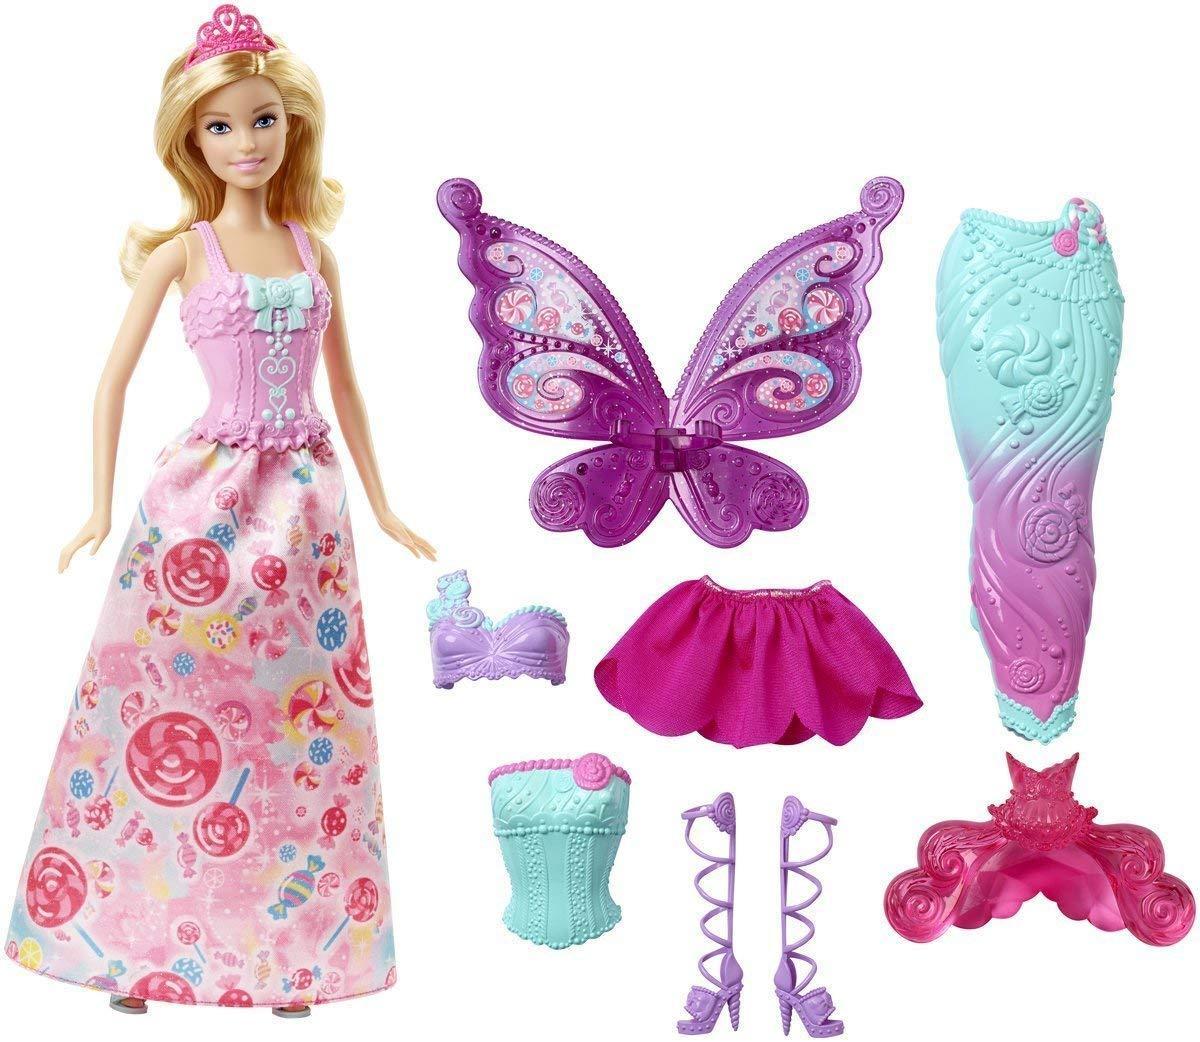 Кукла Барби Дримтопия Сказочное превращение Barbie Dreamtopia Fairytale Dress Up Doll